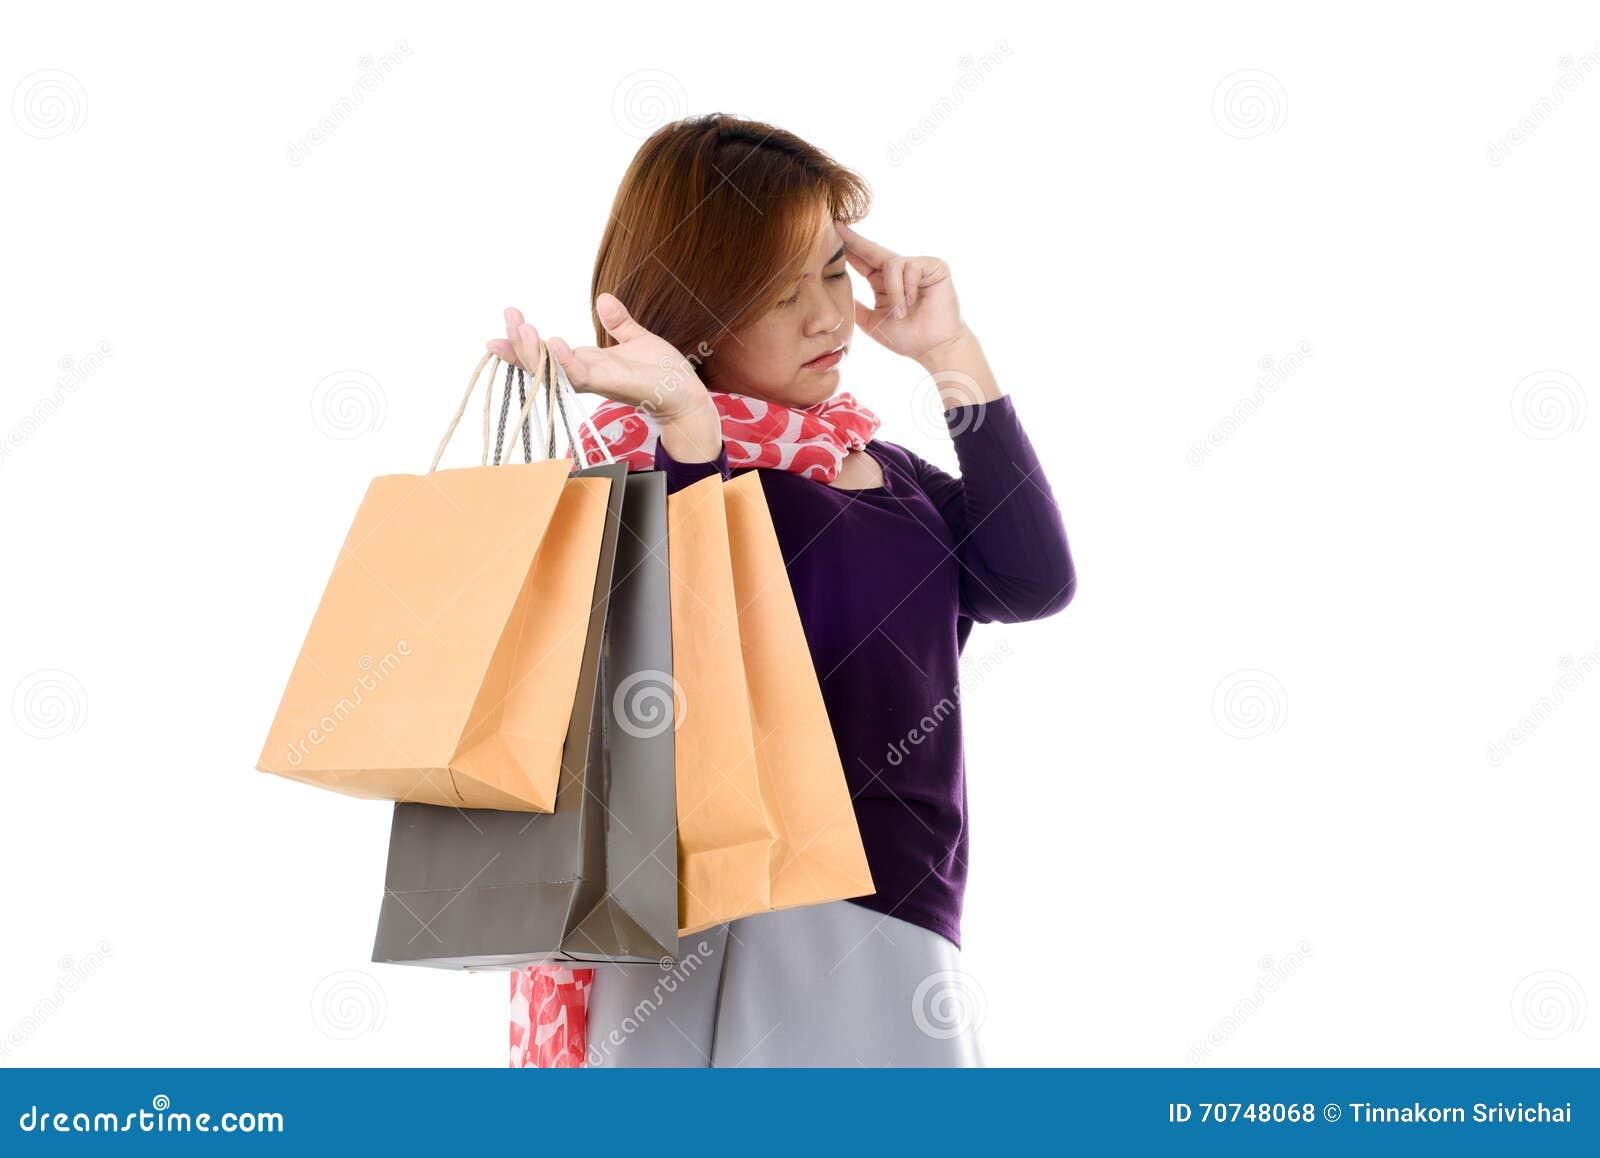 Headache Woman holding few shopping bags